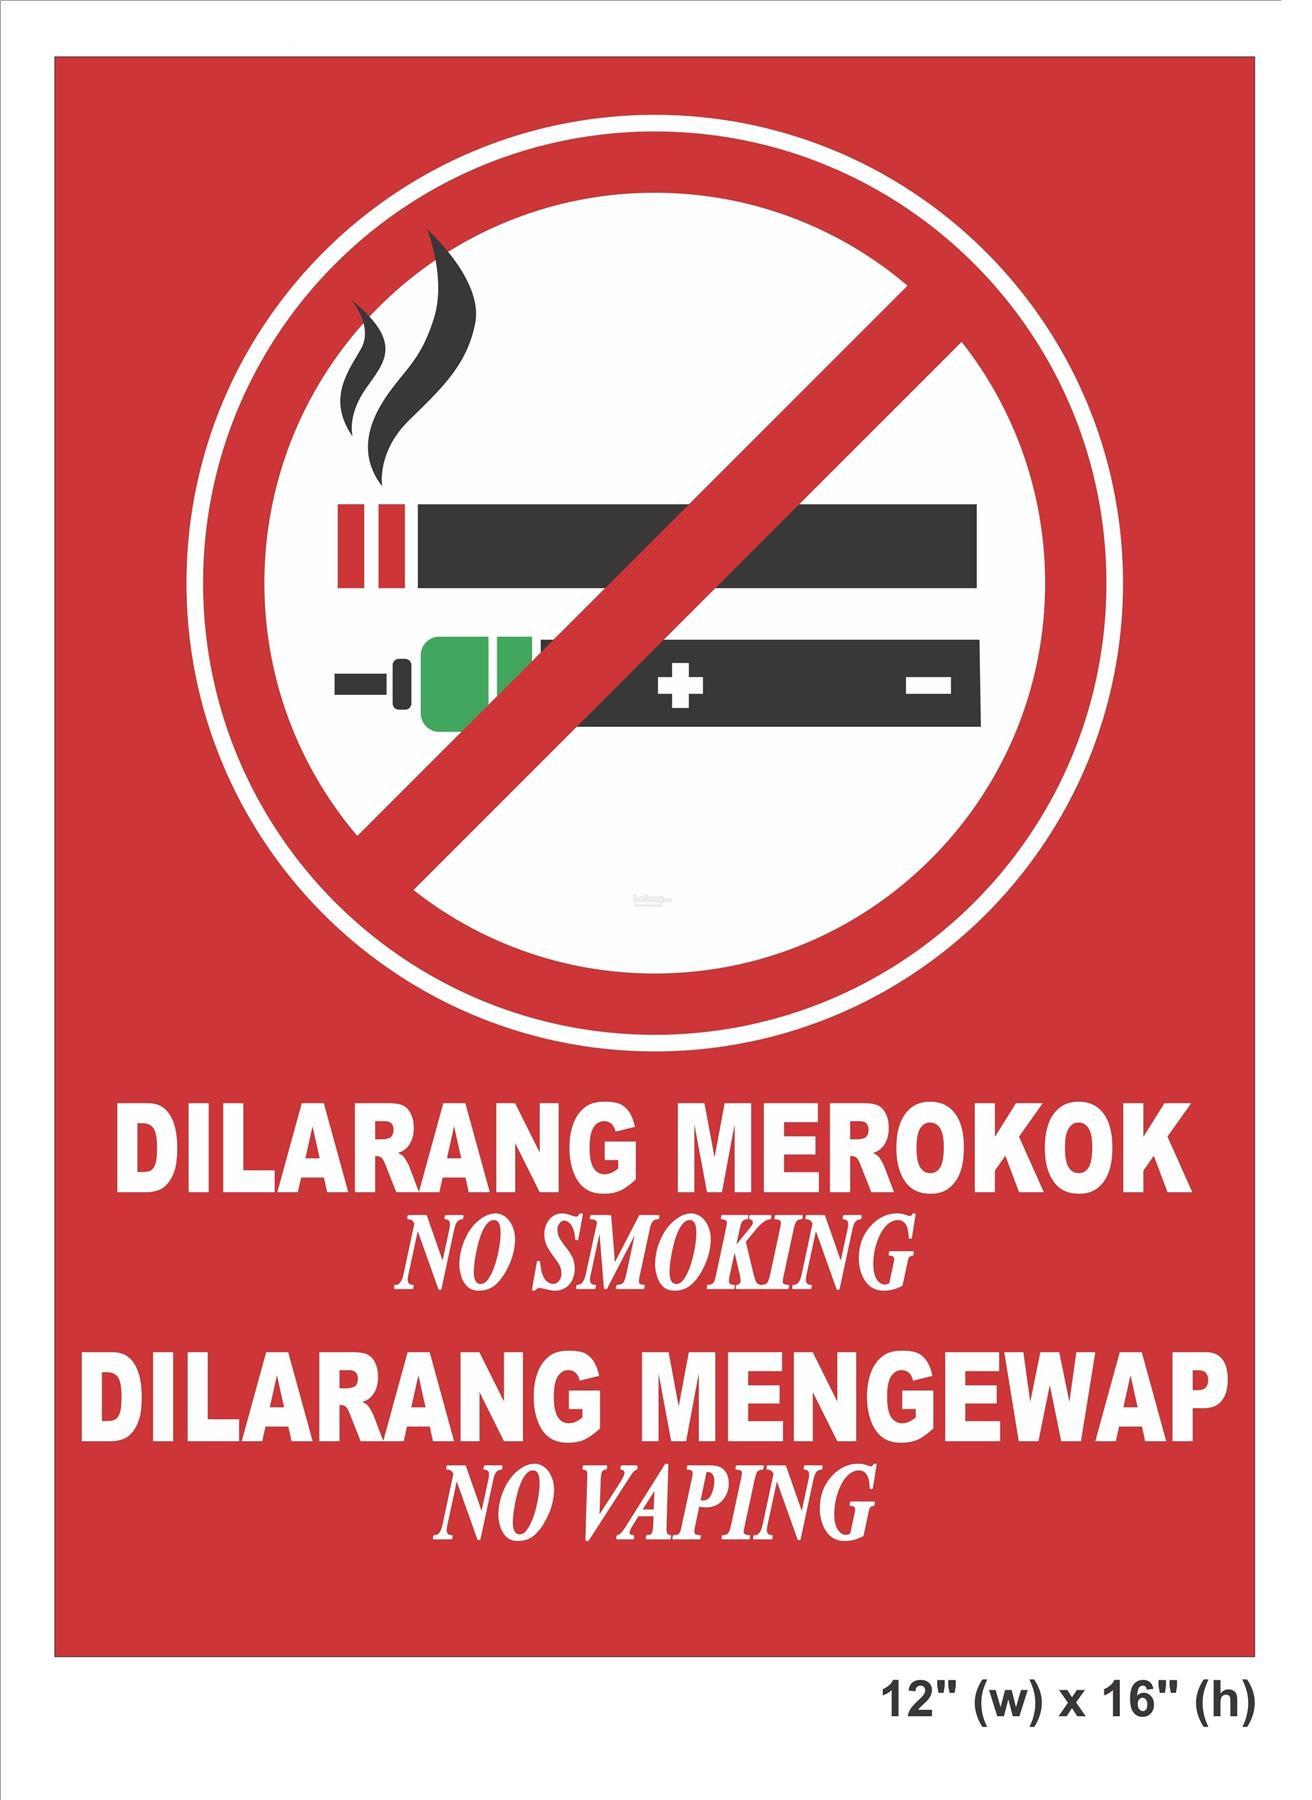 No Vaping Amp No Smoking Signboard 1 End 12 11 2018 2 15 Pm